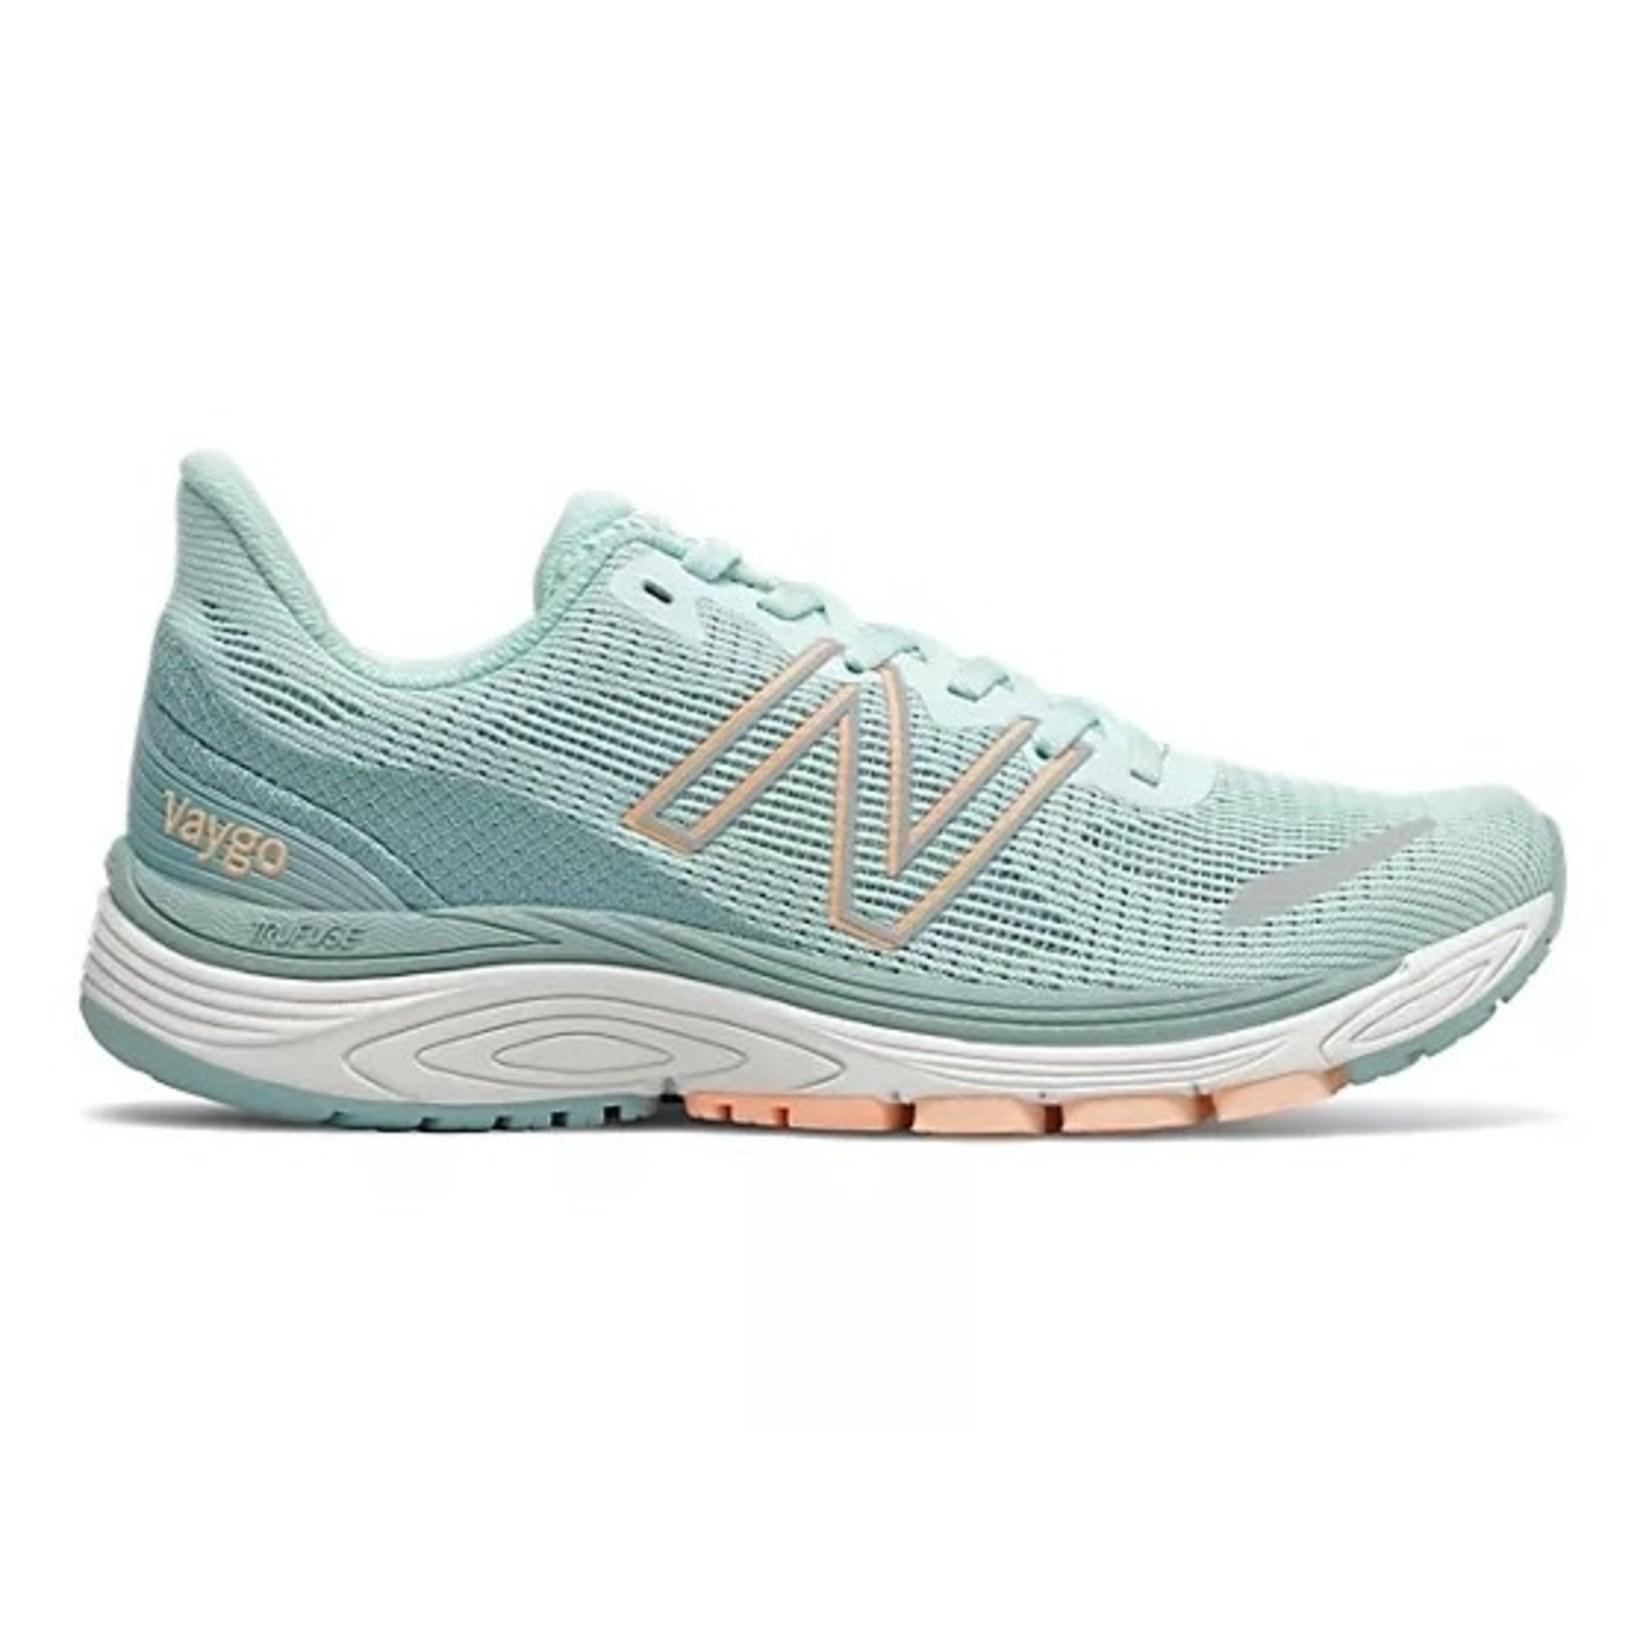 New Balance New Balance Running Shoes, Vaygo v2, Ladies